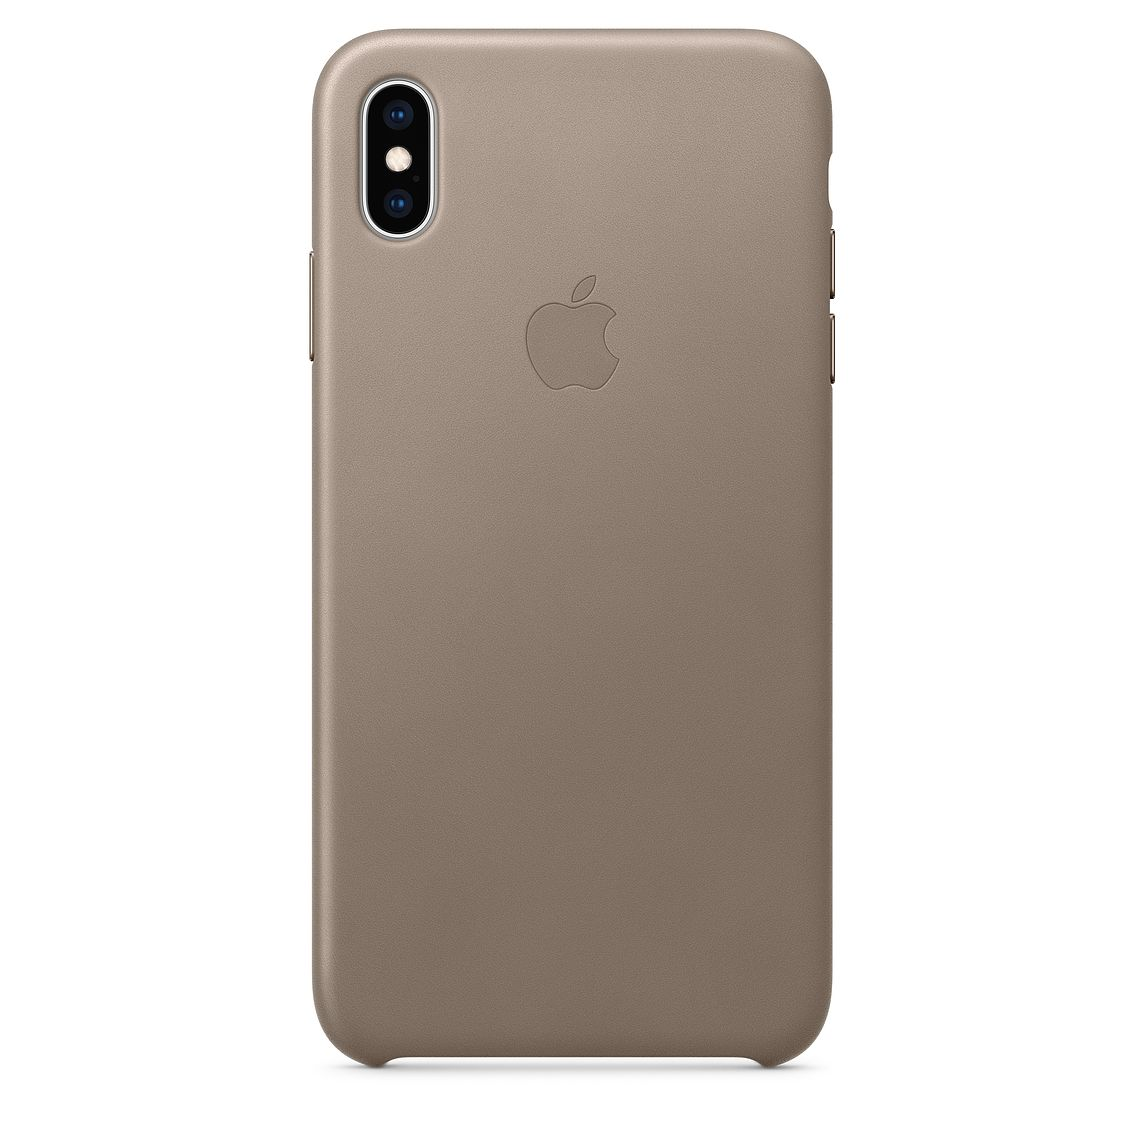 Ochranný kryt pro iPhone XS Max - Apple, Leather Case Taupe